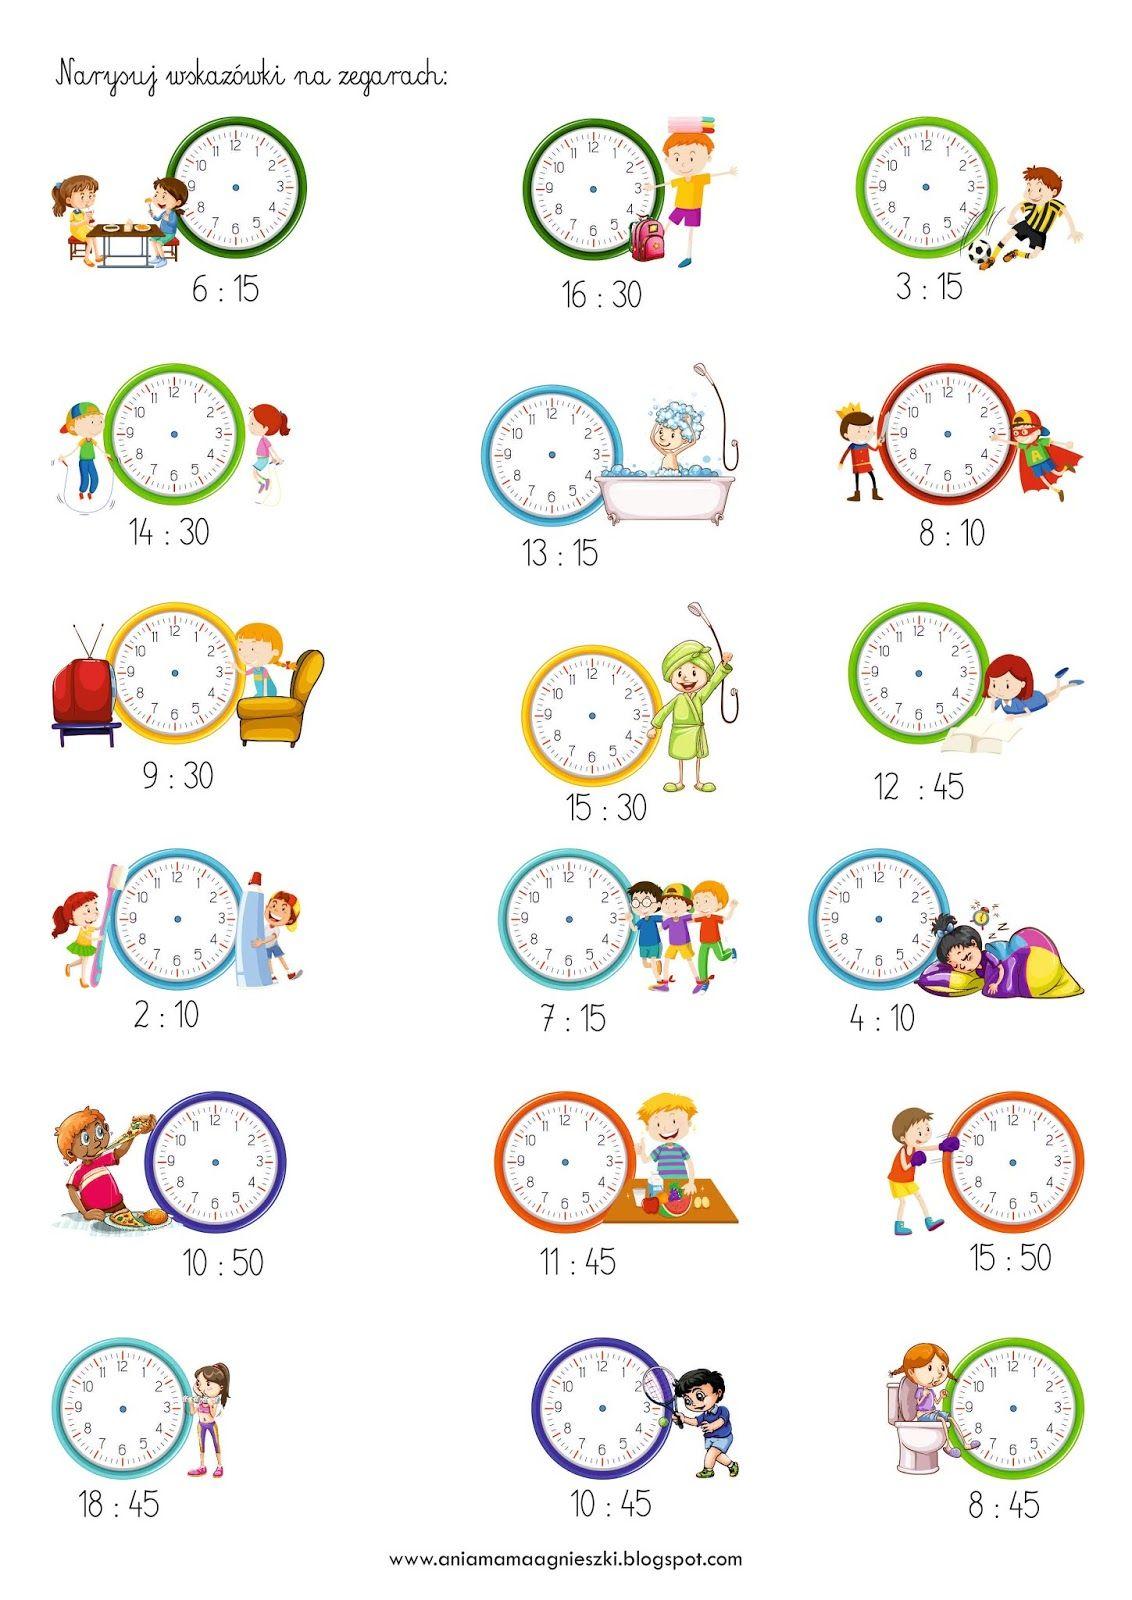 Ania Mama Agnieszki Zegar Godziny Minuty Zadania Fun Math Worksheets Kids Math Worksheets Learning Math [ 1600 x 1132 Pixel ]